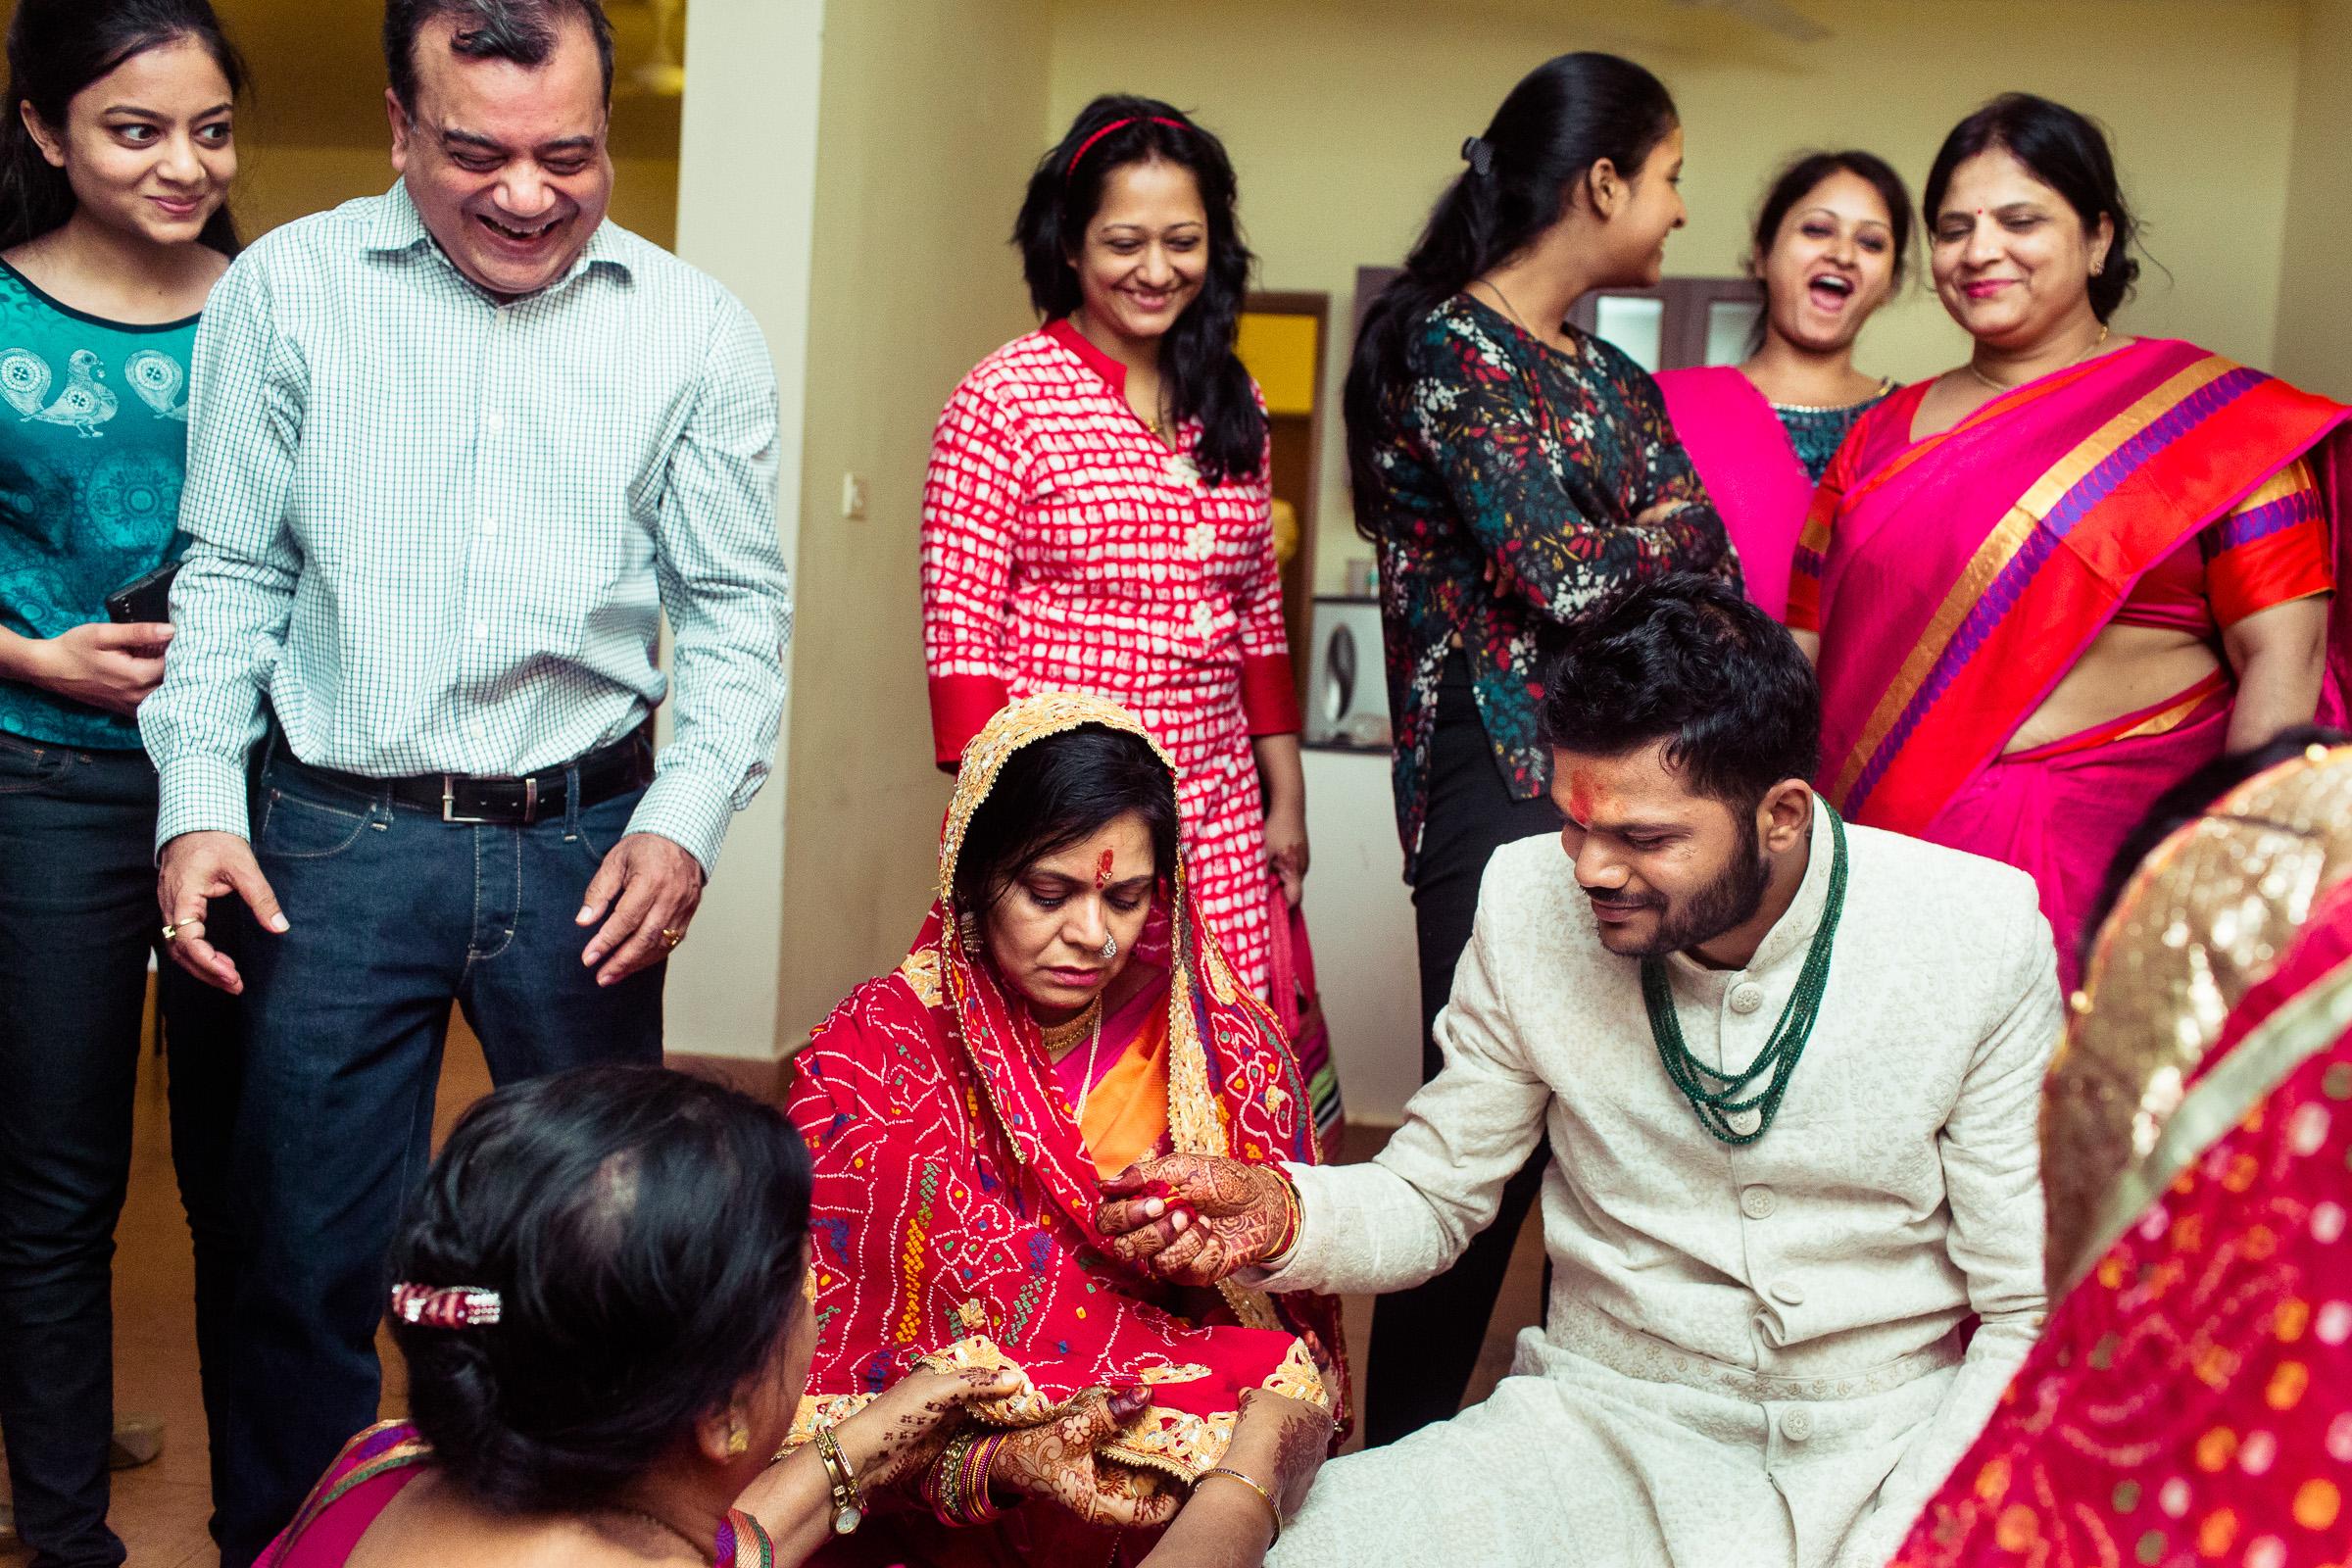 marwari-candid-wedding-photographers-bangalore-0061.jpg